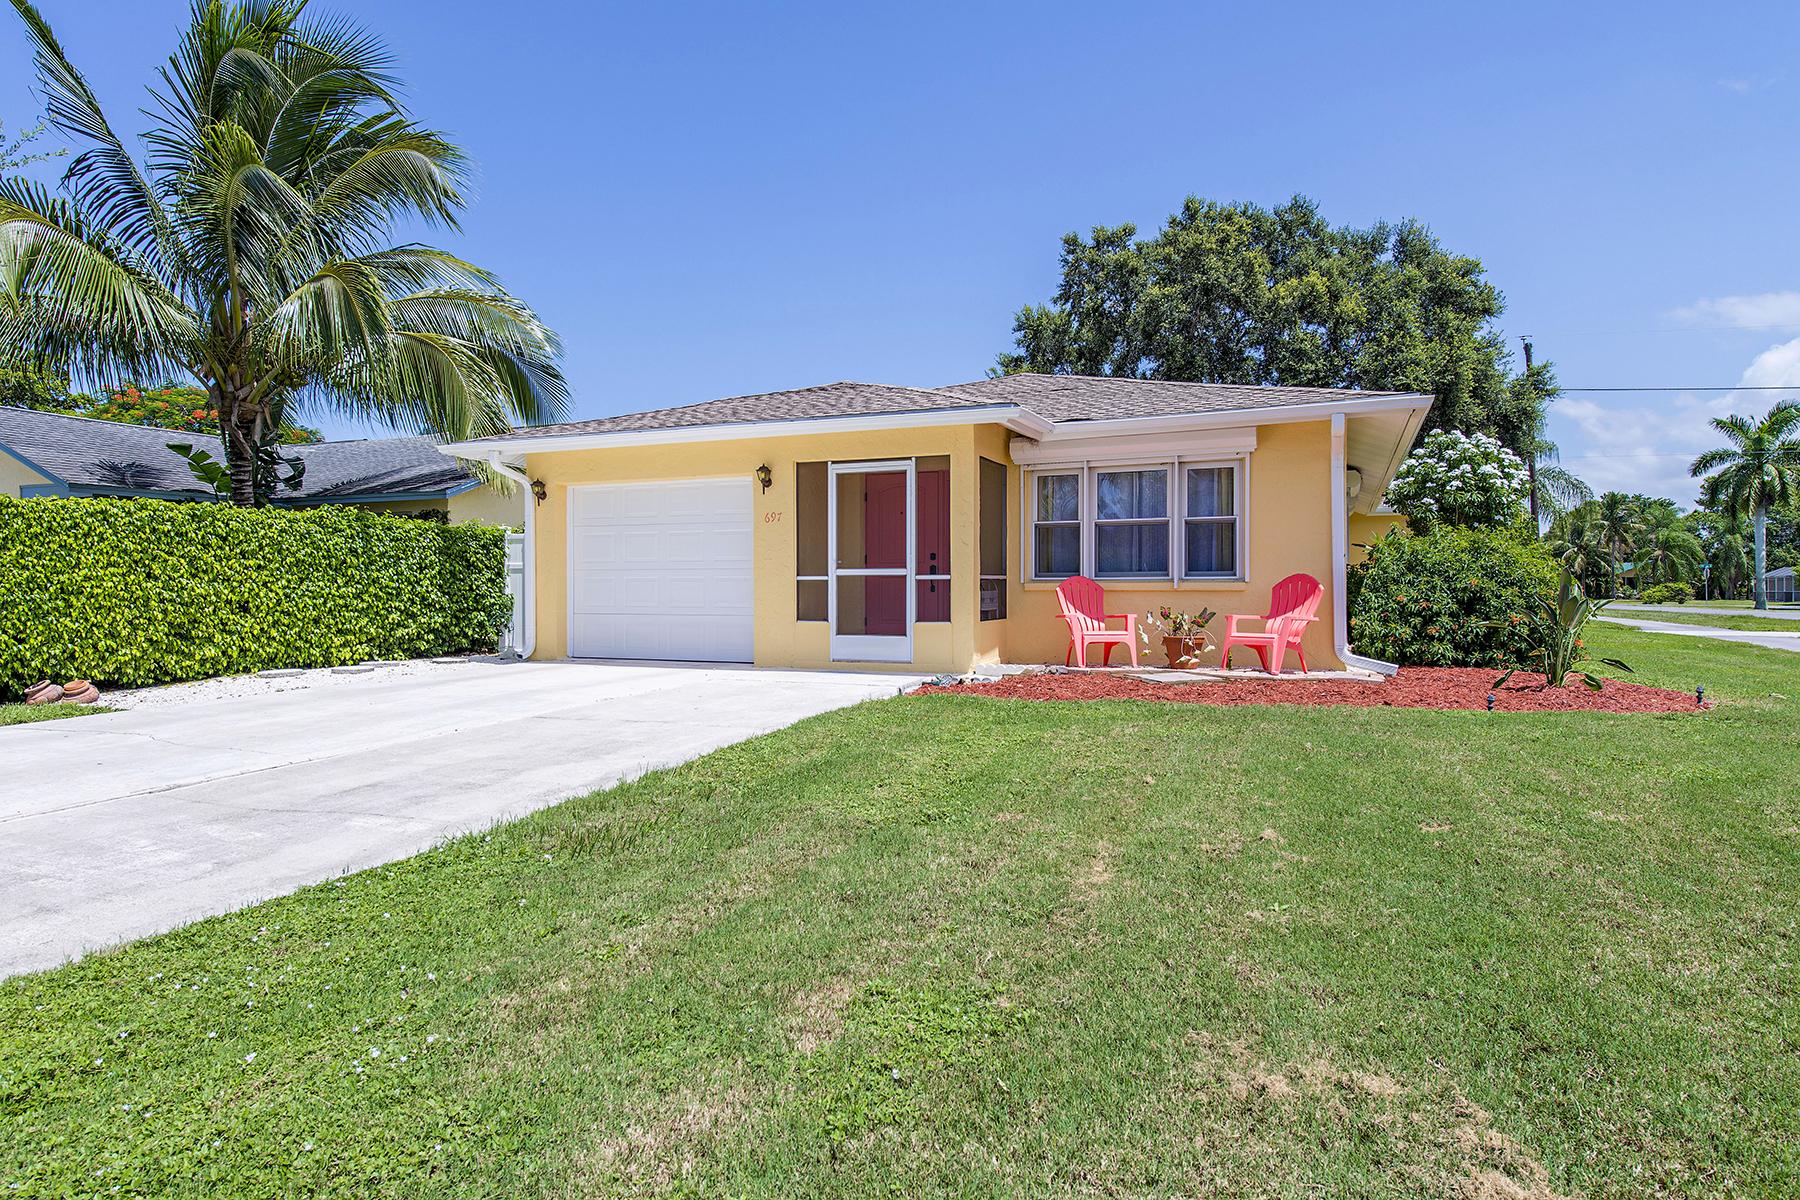 Villa per Vendita alle ore NAPLES PARK 697 93rd Ave N Naples, Florida 34108 Stati Uniti